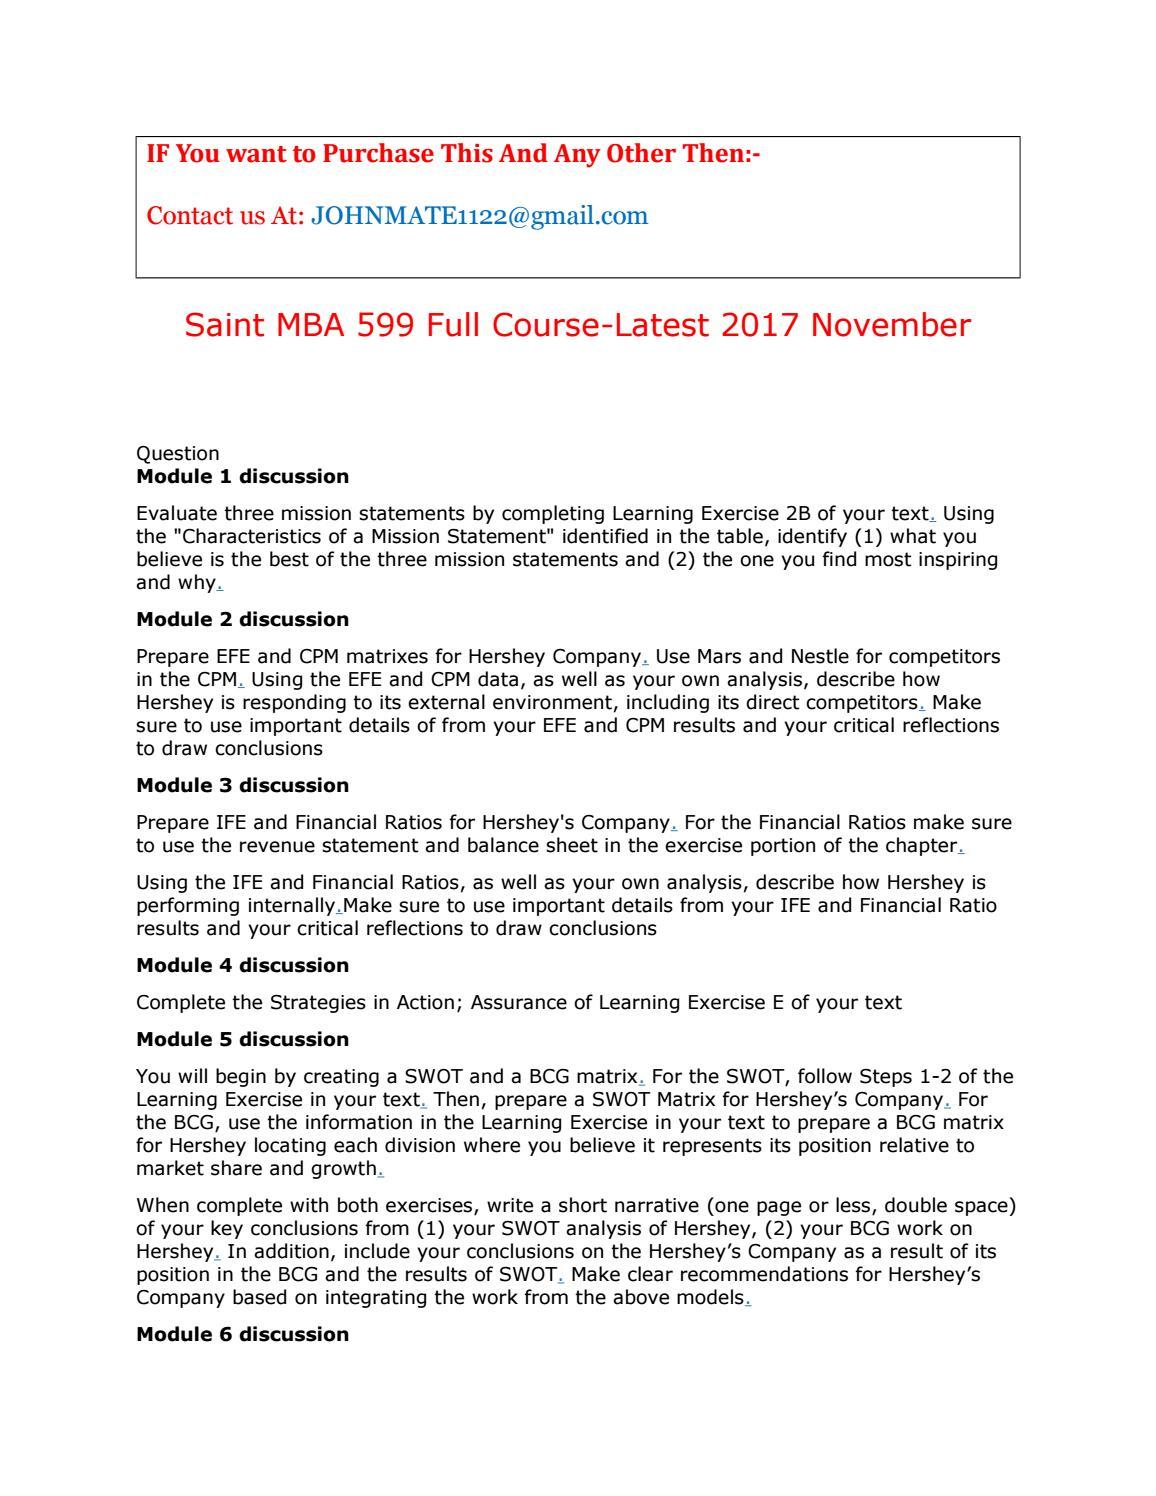 essay on navratri in english language